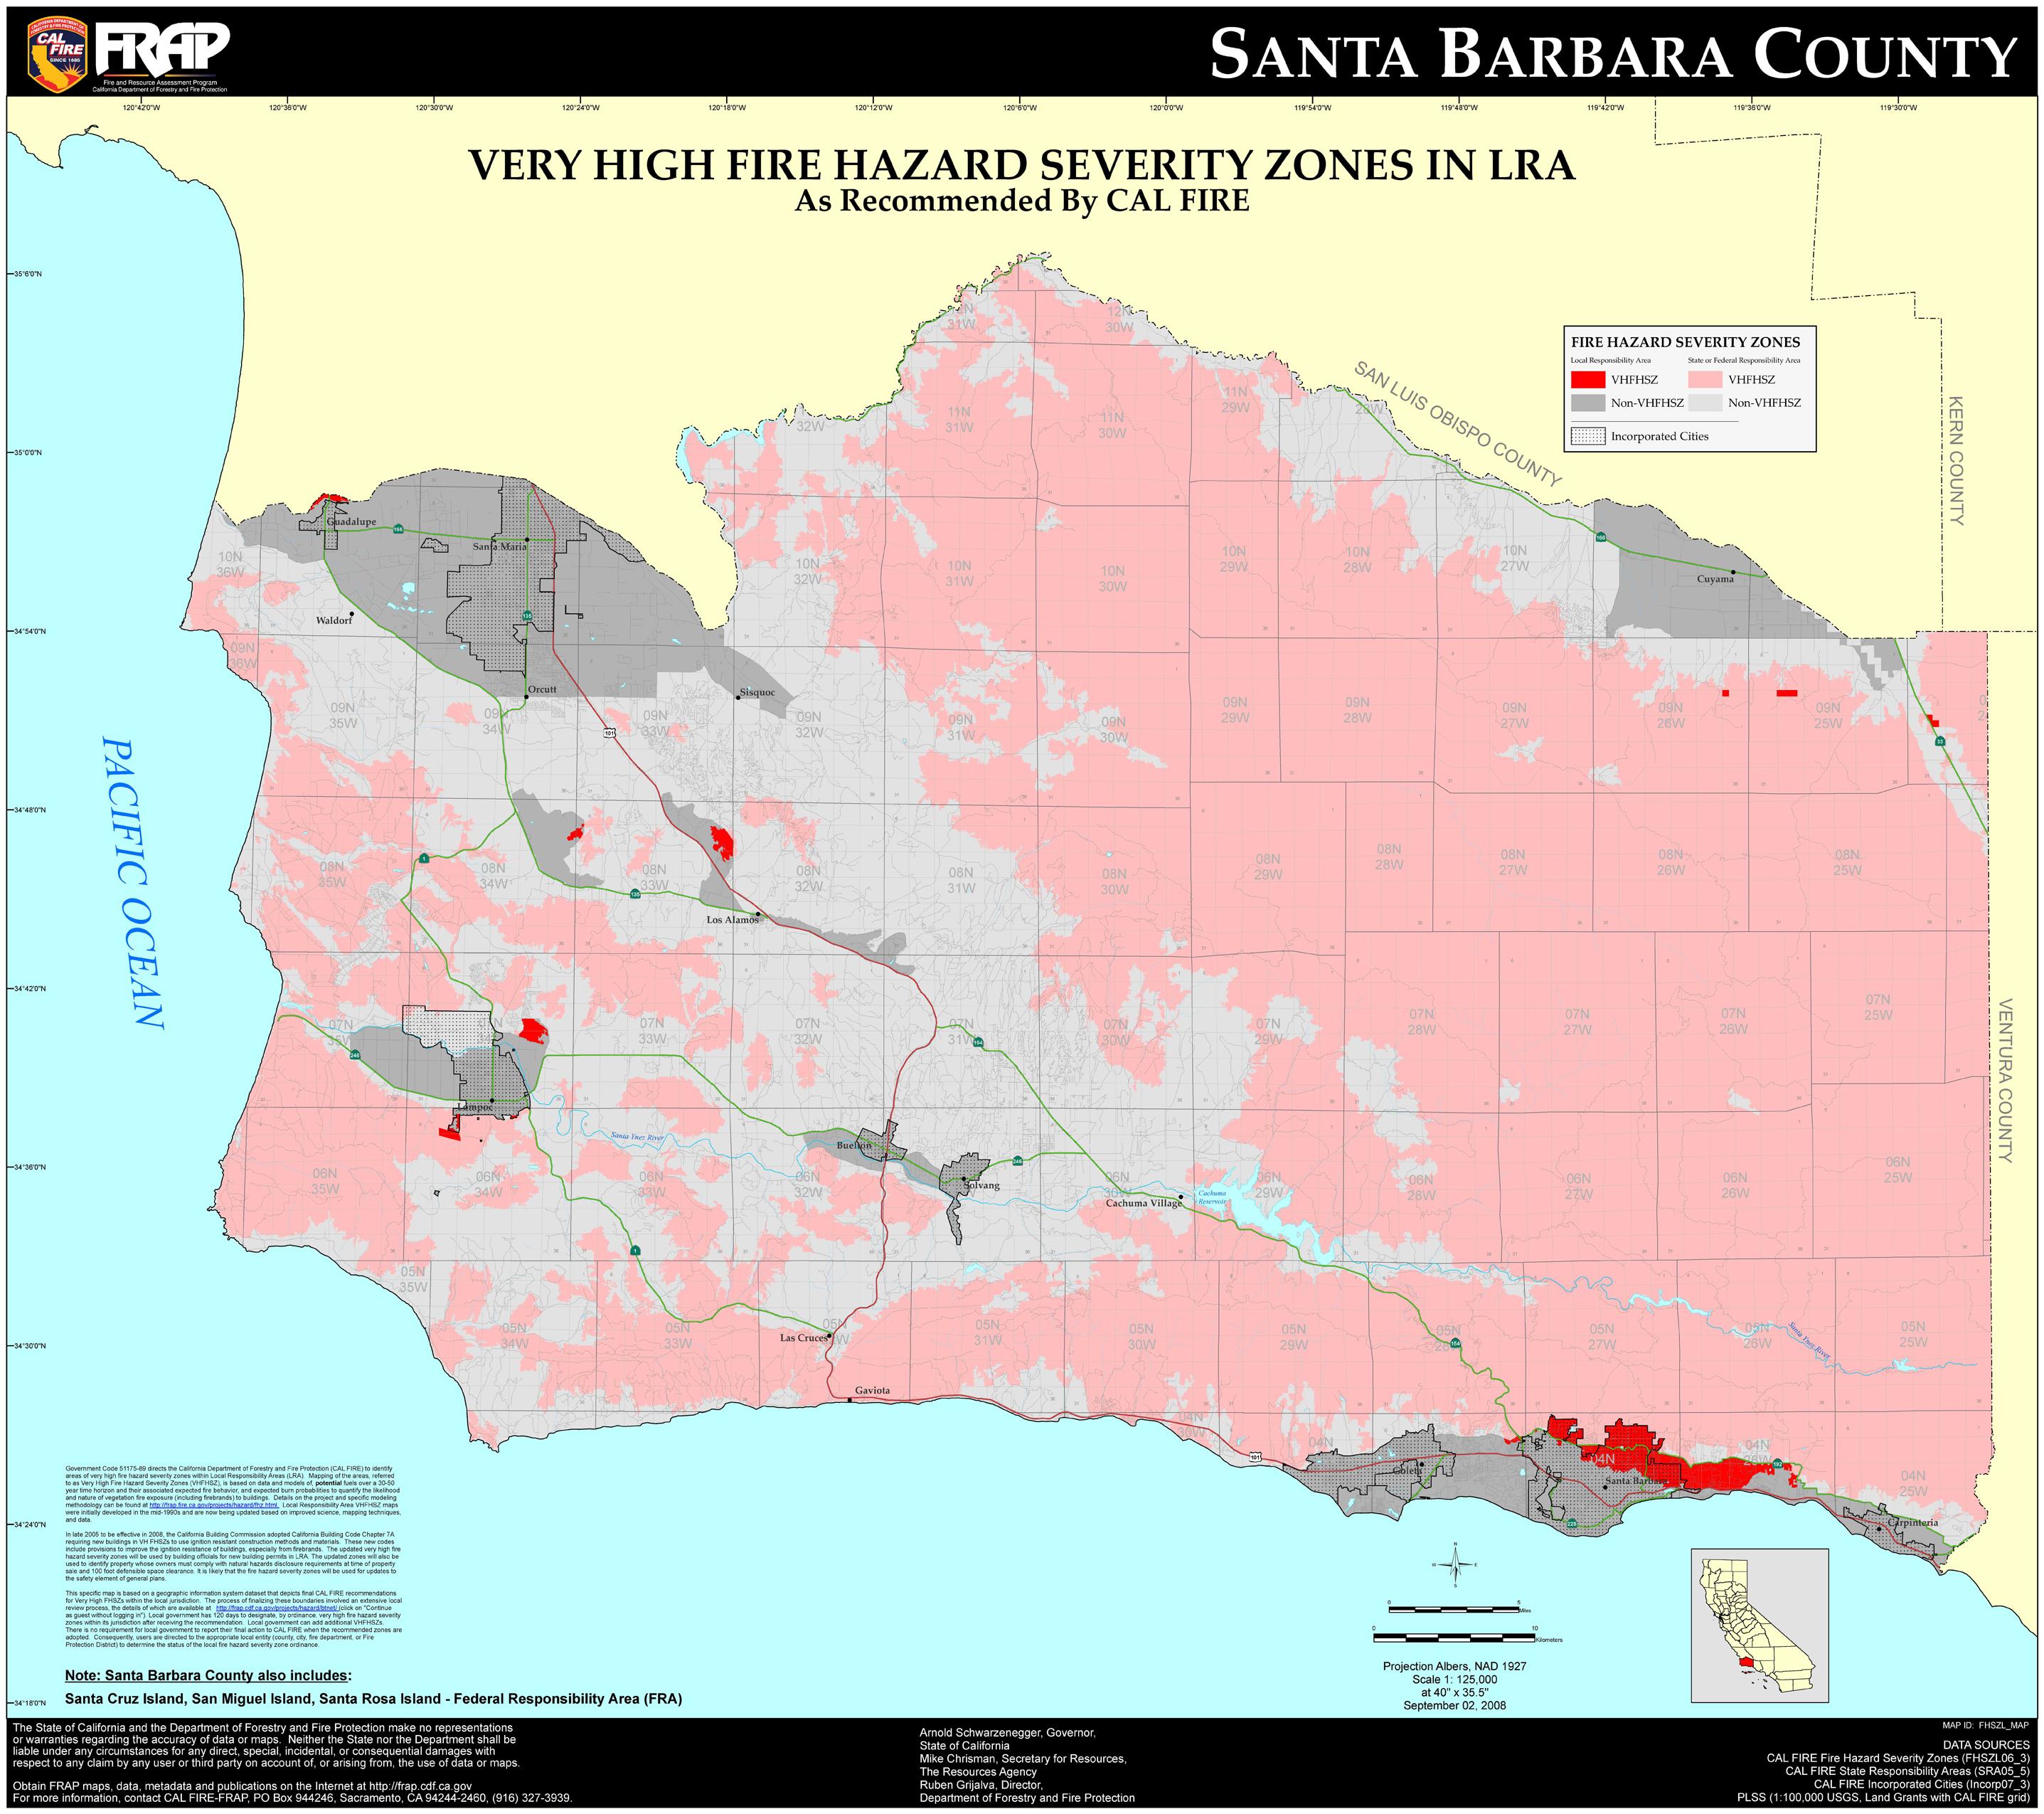 Santa Barbara On California Map - Klipy - Santa Barbara California Map